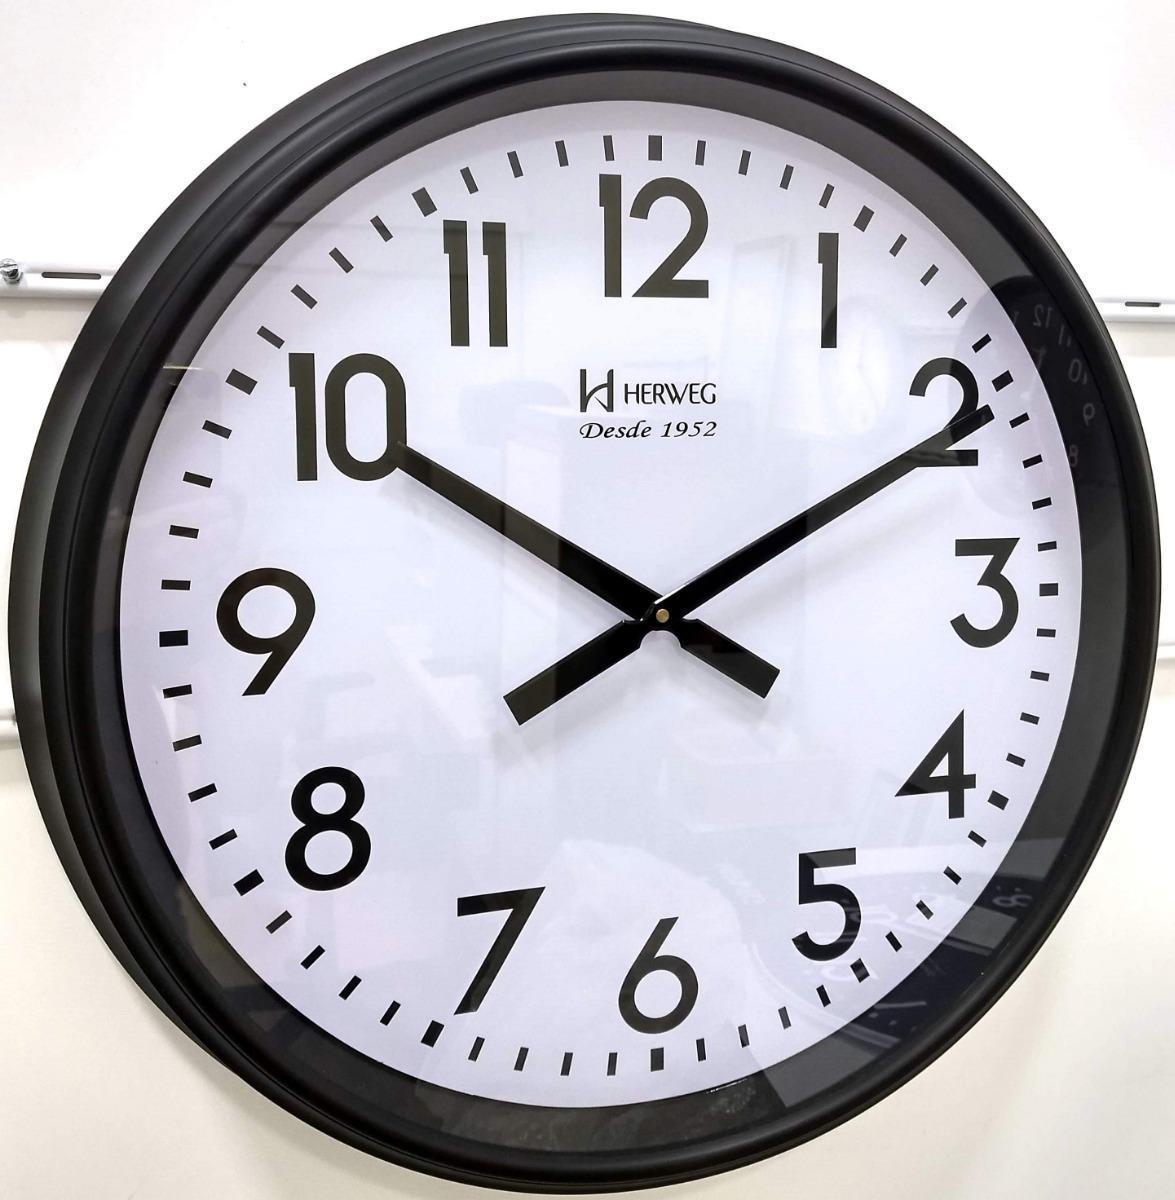 Relógio De Parede Herweg Ref: 6463-021 Branco